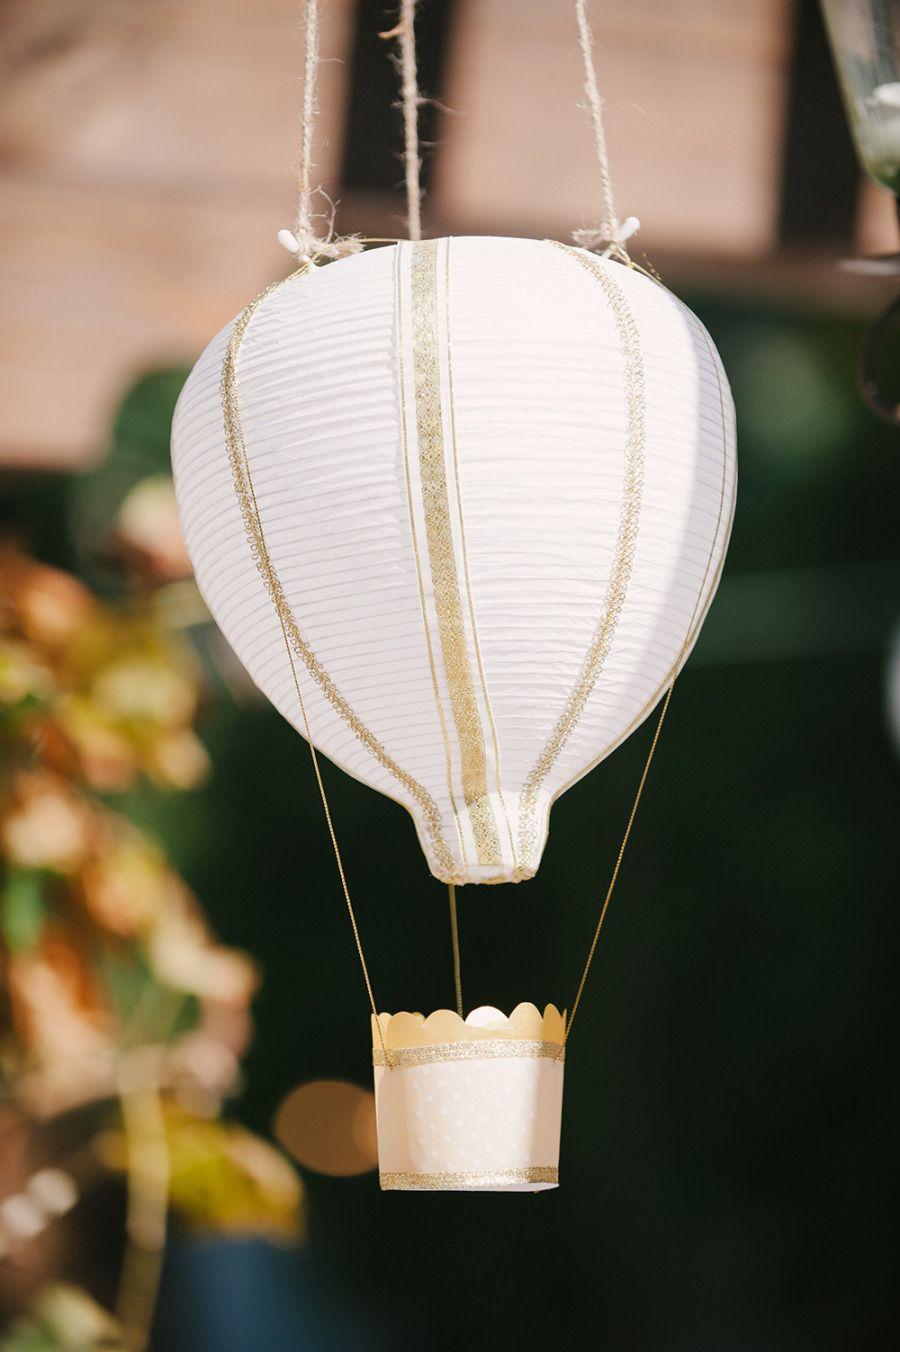 Wedding ideas with lanterns  Whimsical DIY Garden Wedding at Franciscan Gardens  Hot air